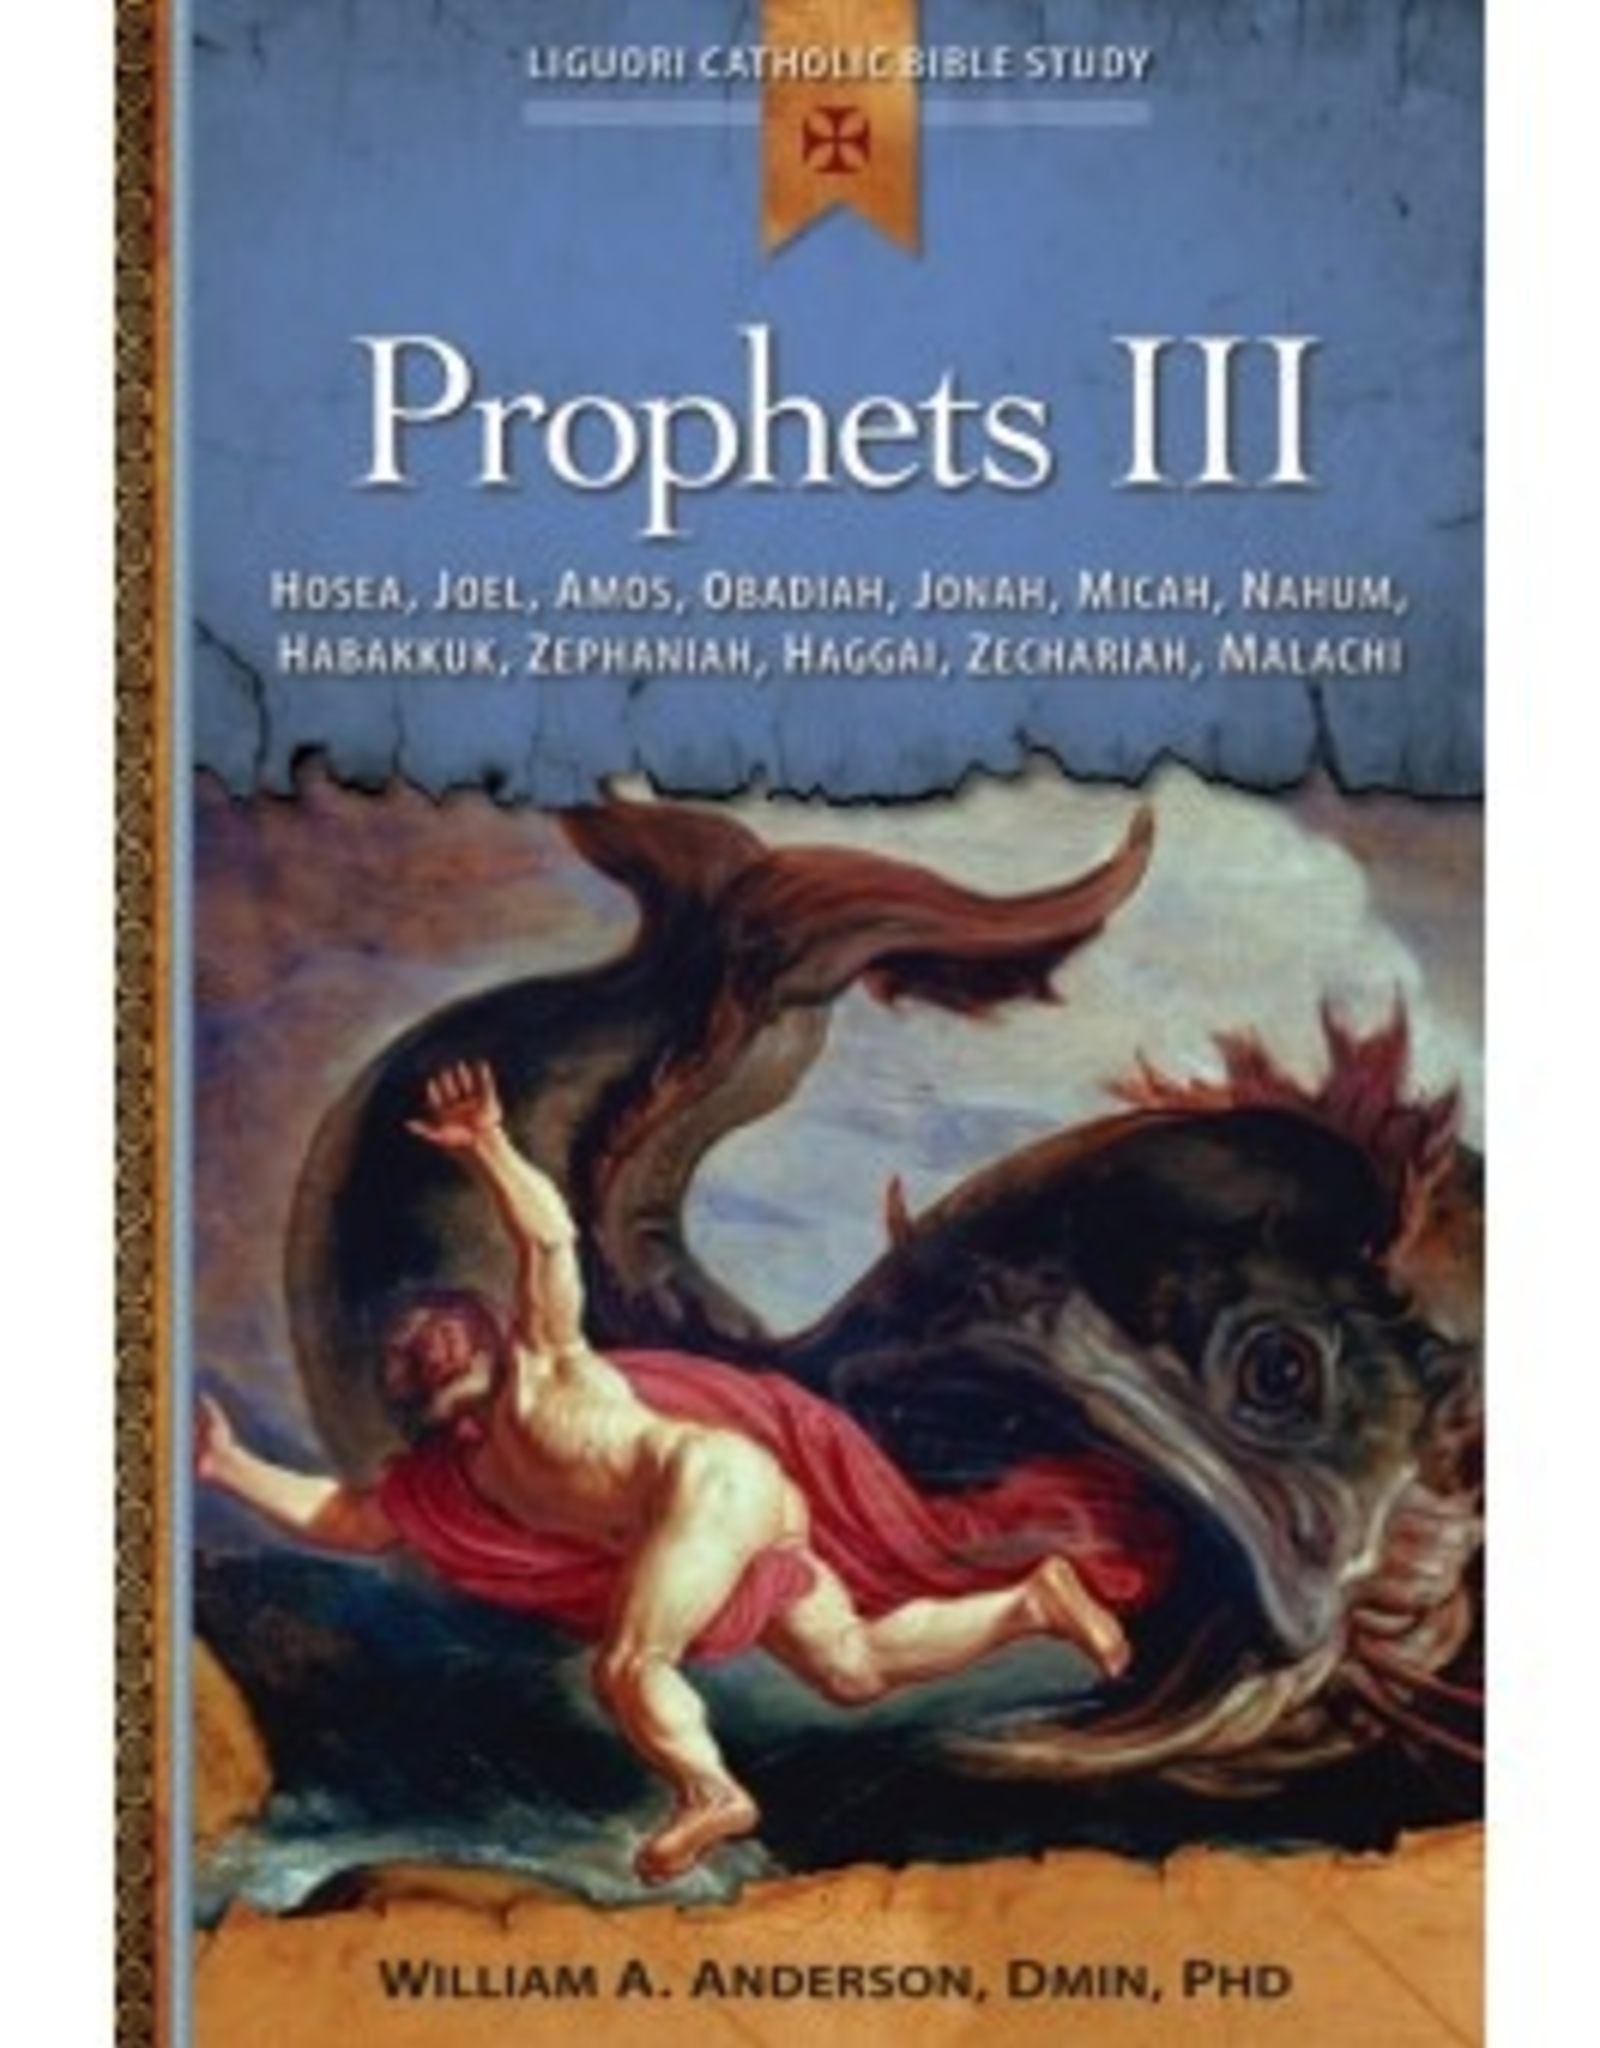 Liguori Prophets III:  Hosea, Joel, Amos, Obadiah, Jonah, Micah, Nahum, Habakkuk, Zephaniah, HAggai, Zechariah, Malachi, by WIlliam Anderson (paperback)